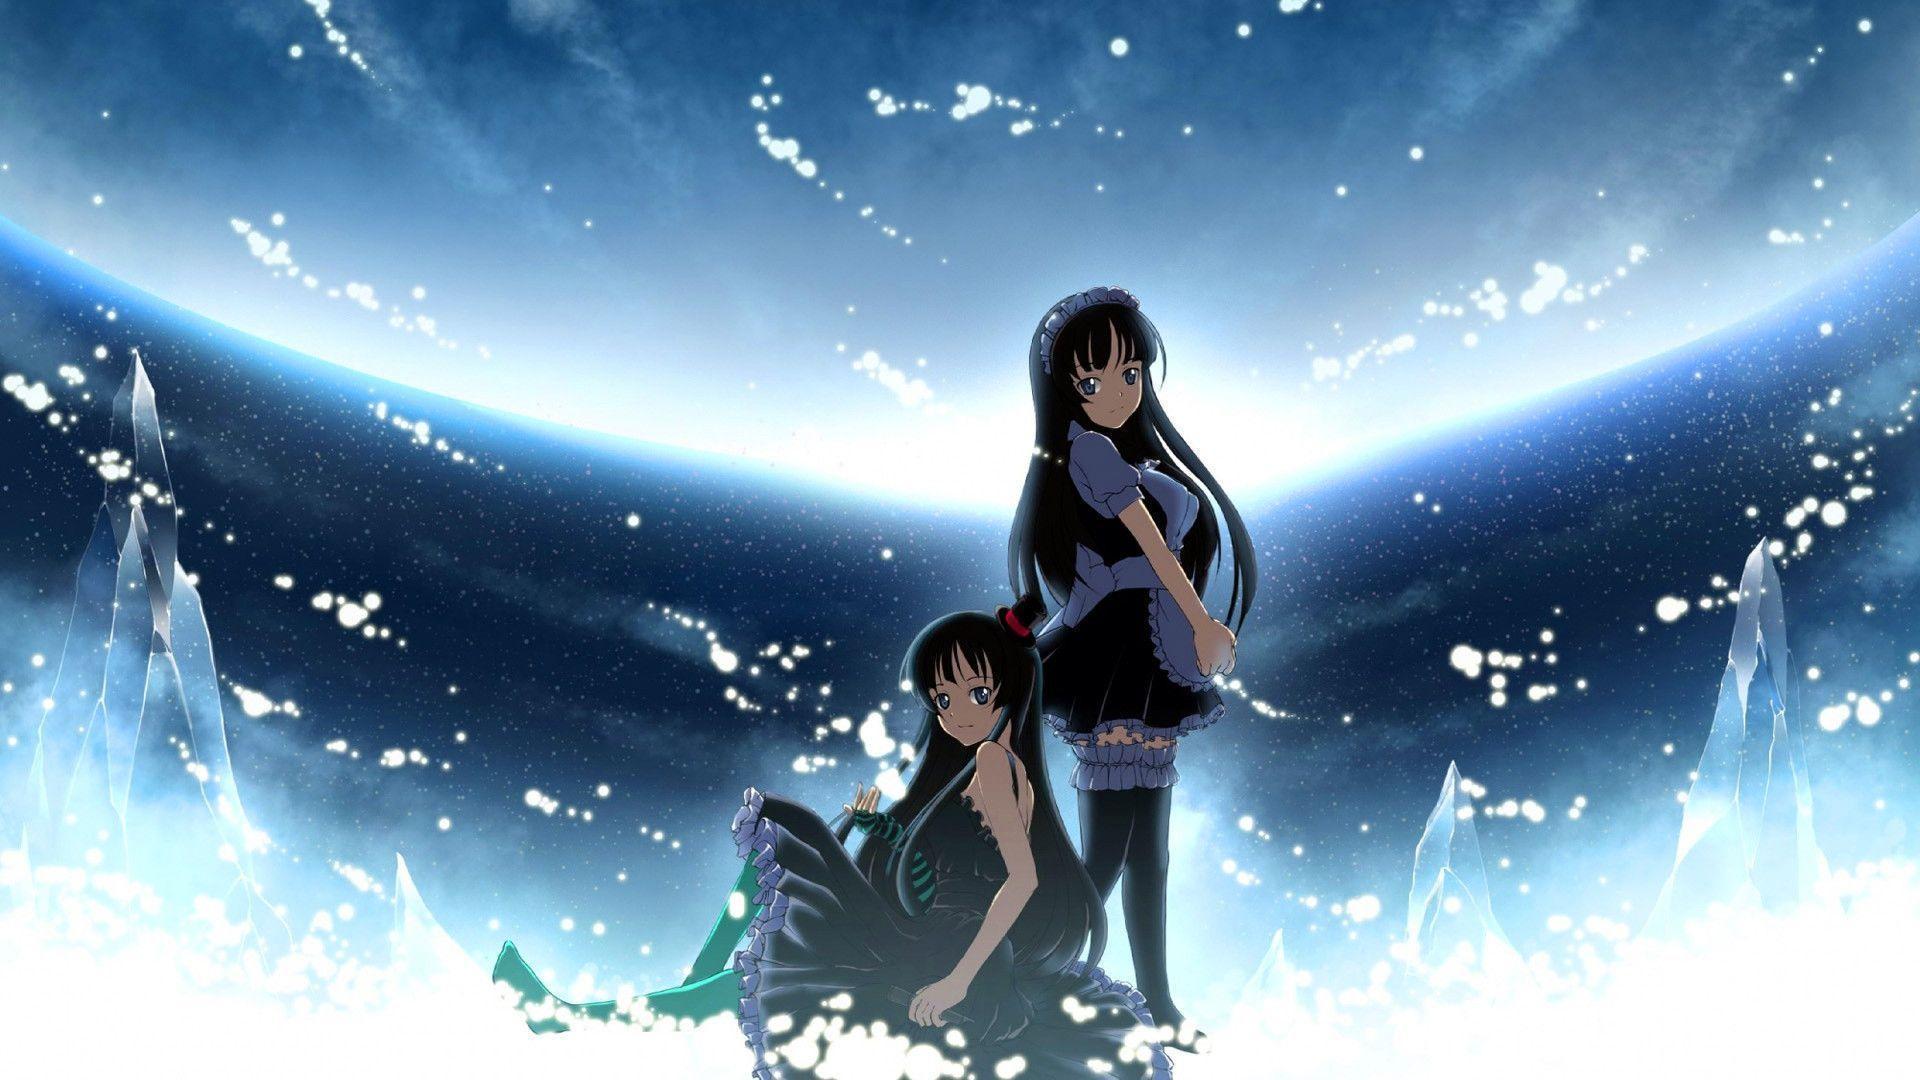 Wallpaper Anime Hd 2021